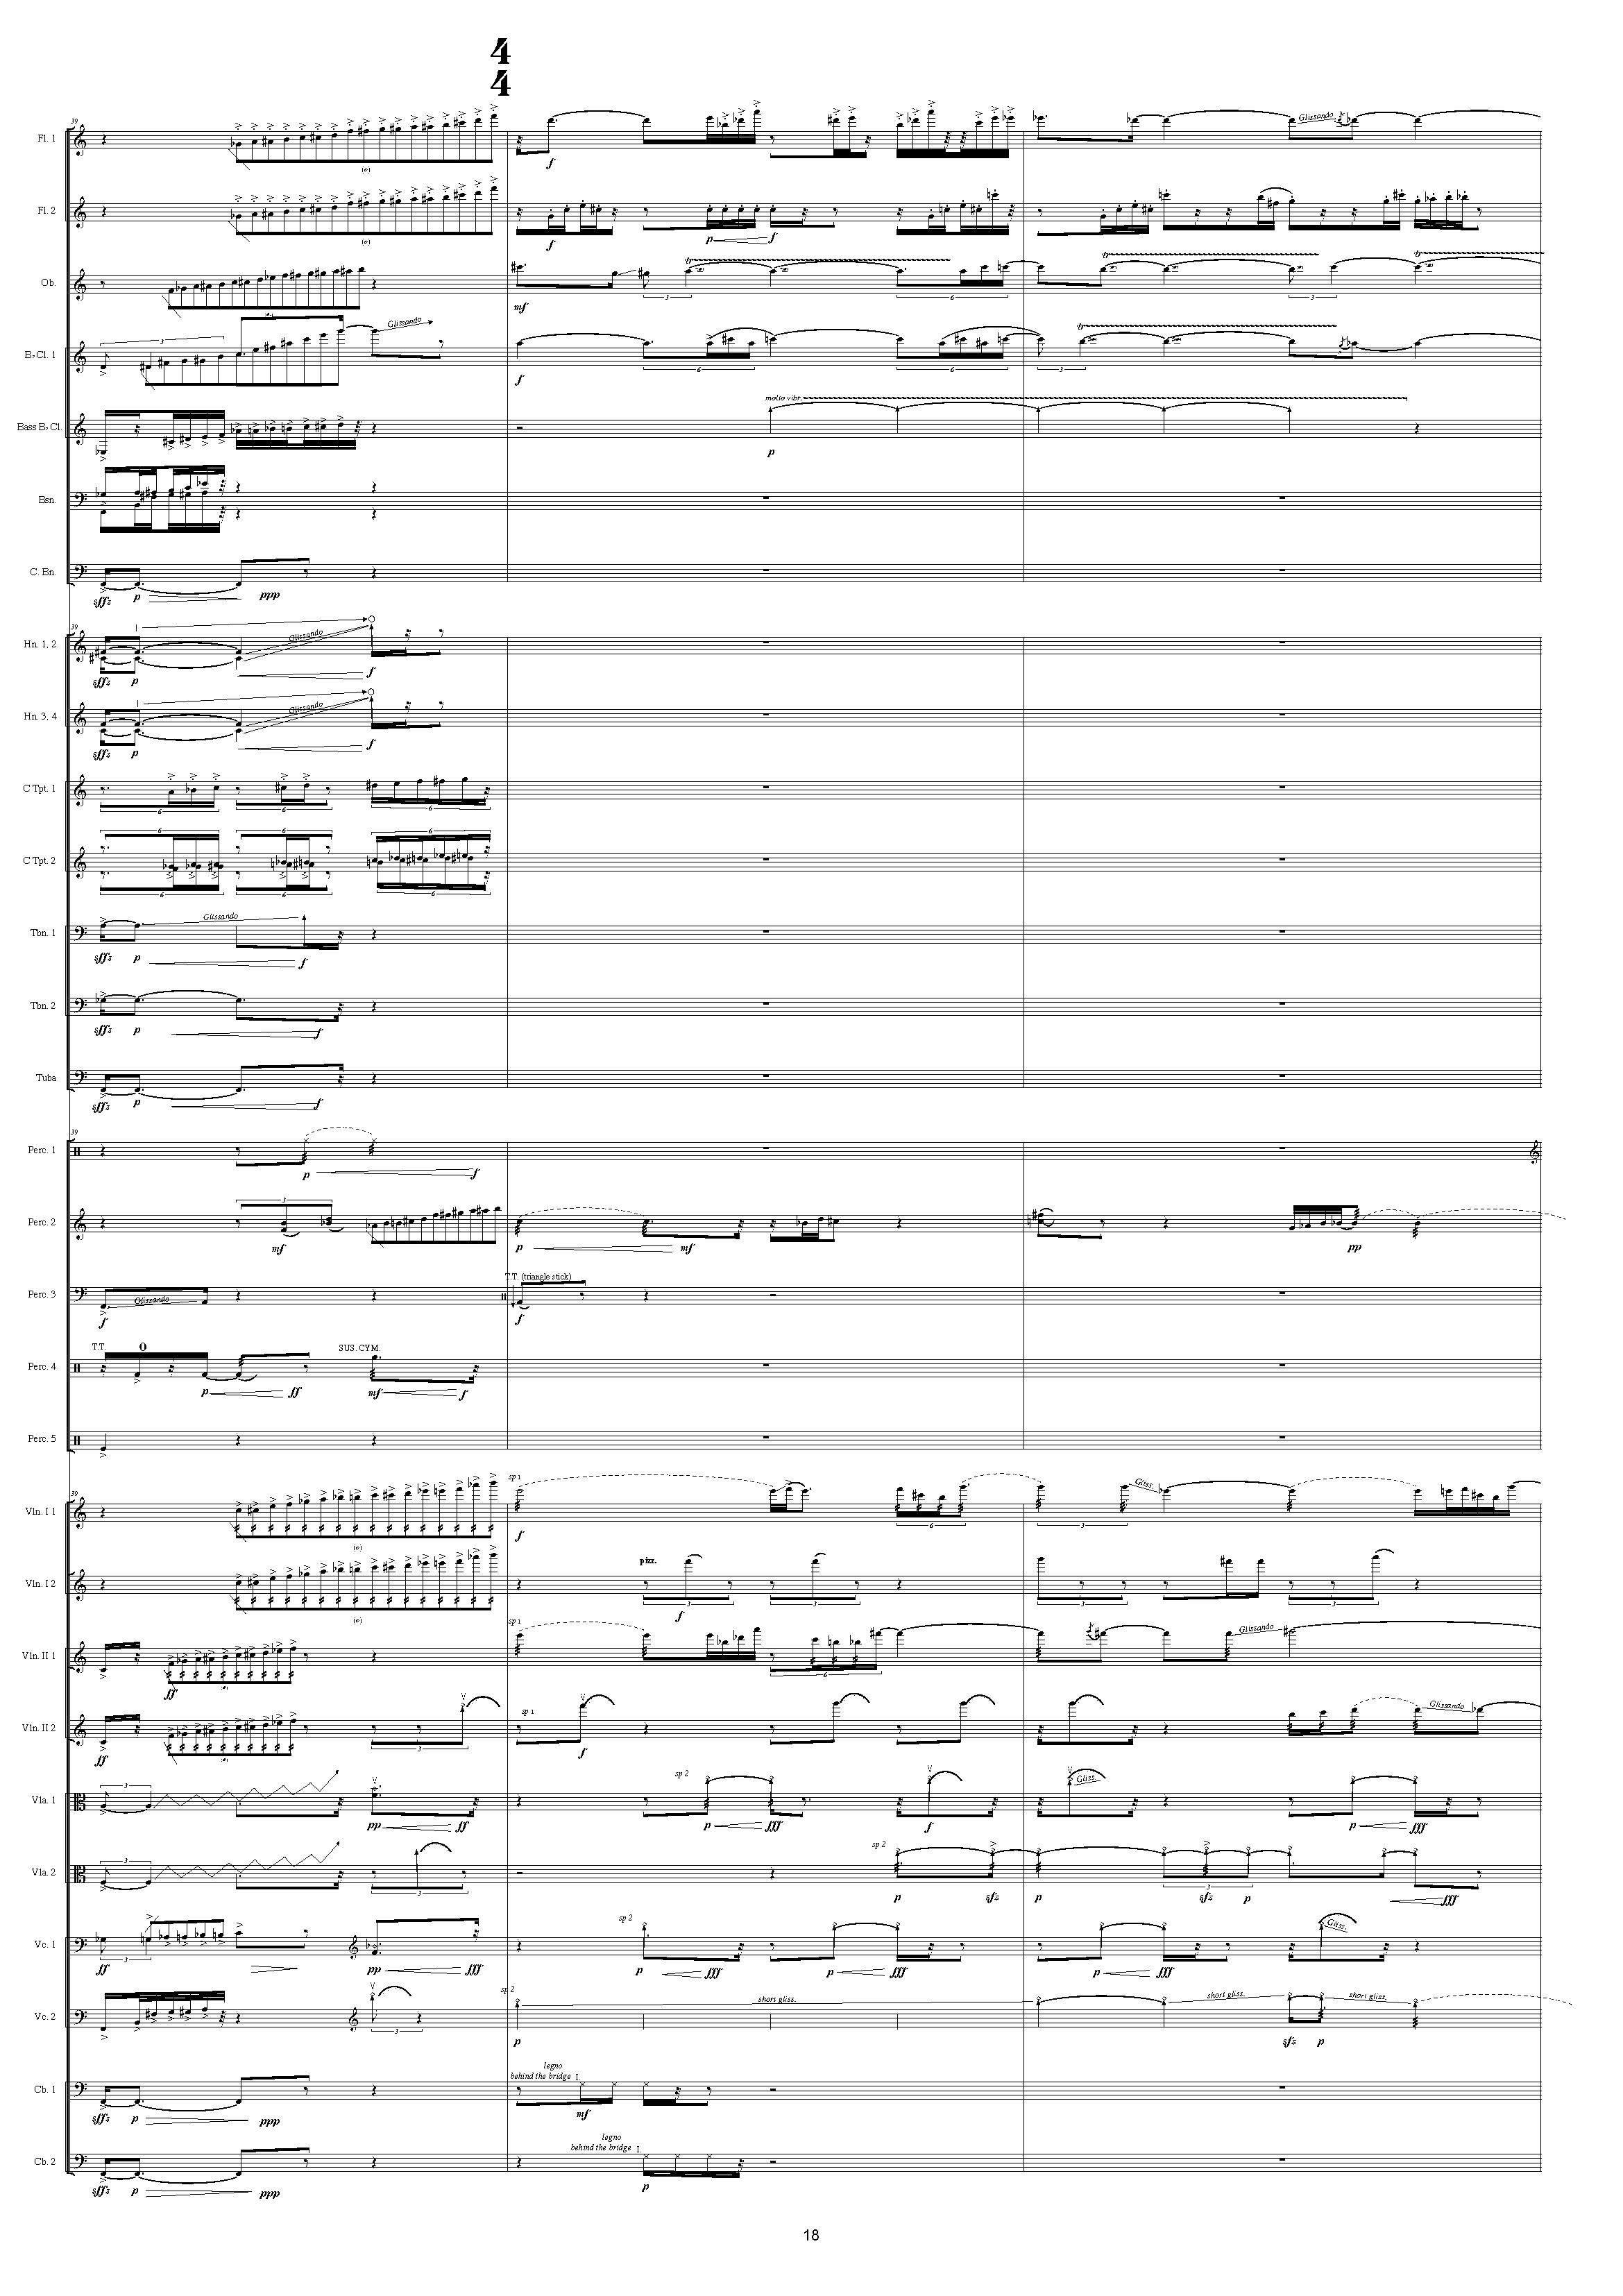 METANOIA_2009-RAPPOPORT_Seite_18.jpg